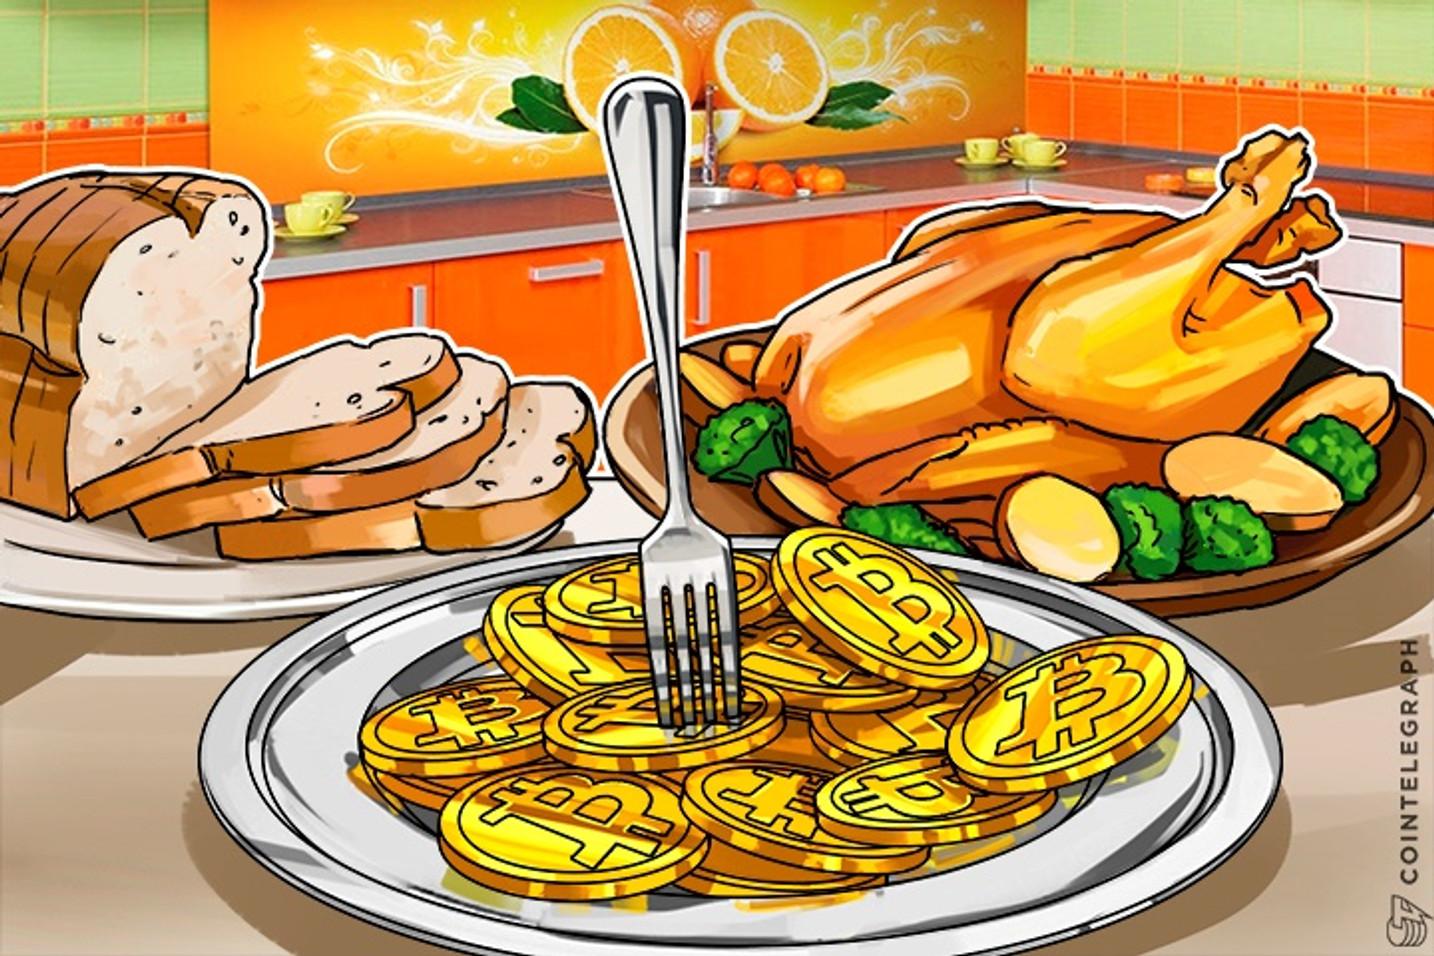 Bitcoin Fork Soon? Bitcoin Unlimited Surges Past SegWit, Core Blocks Drop Below 75%